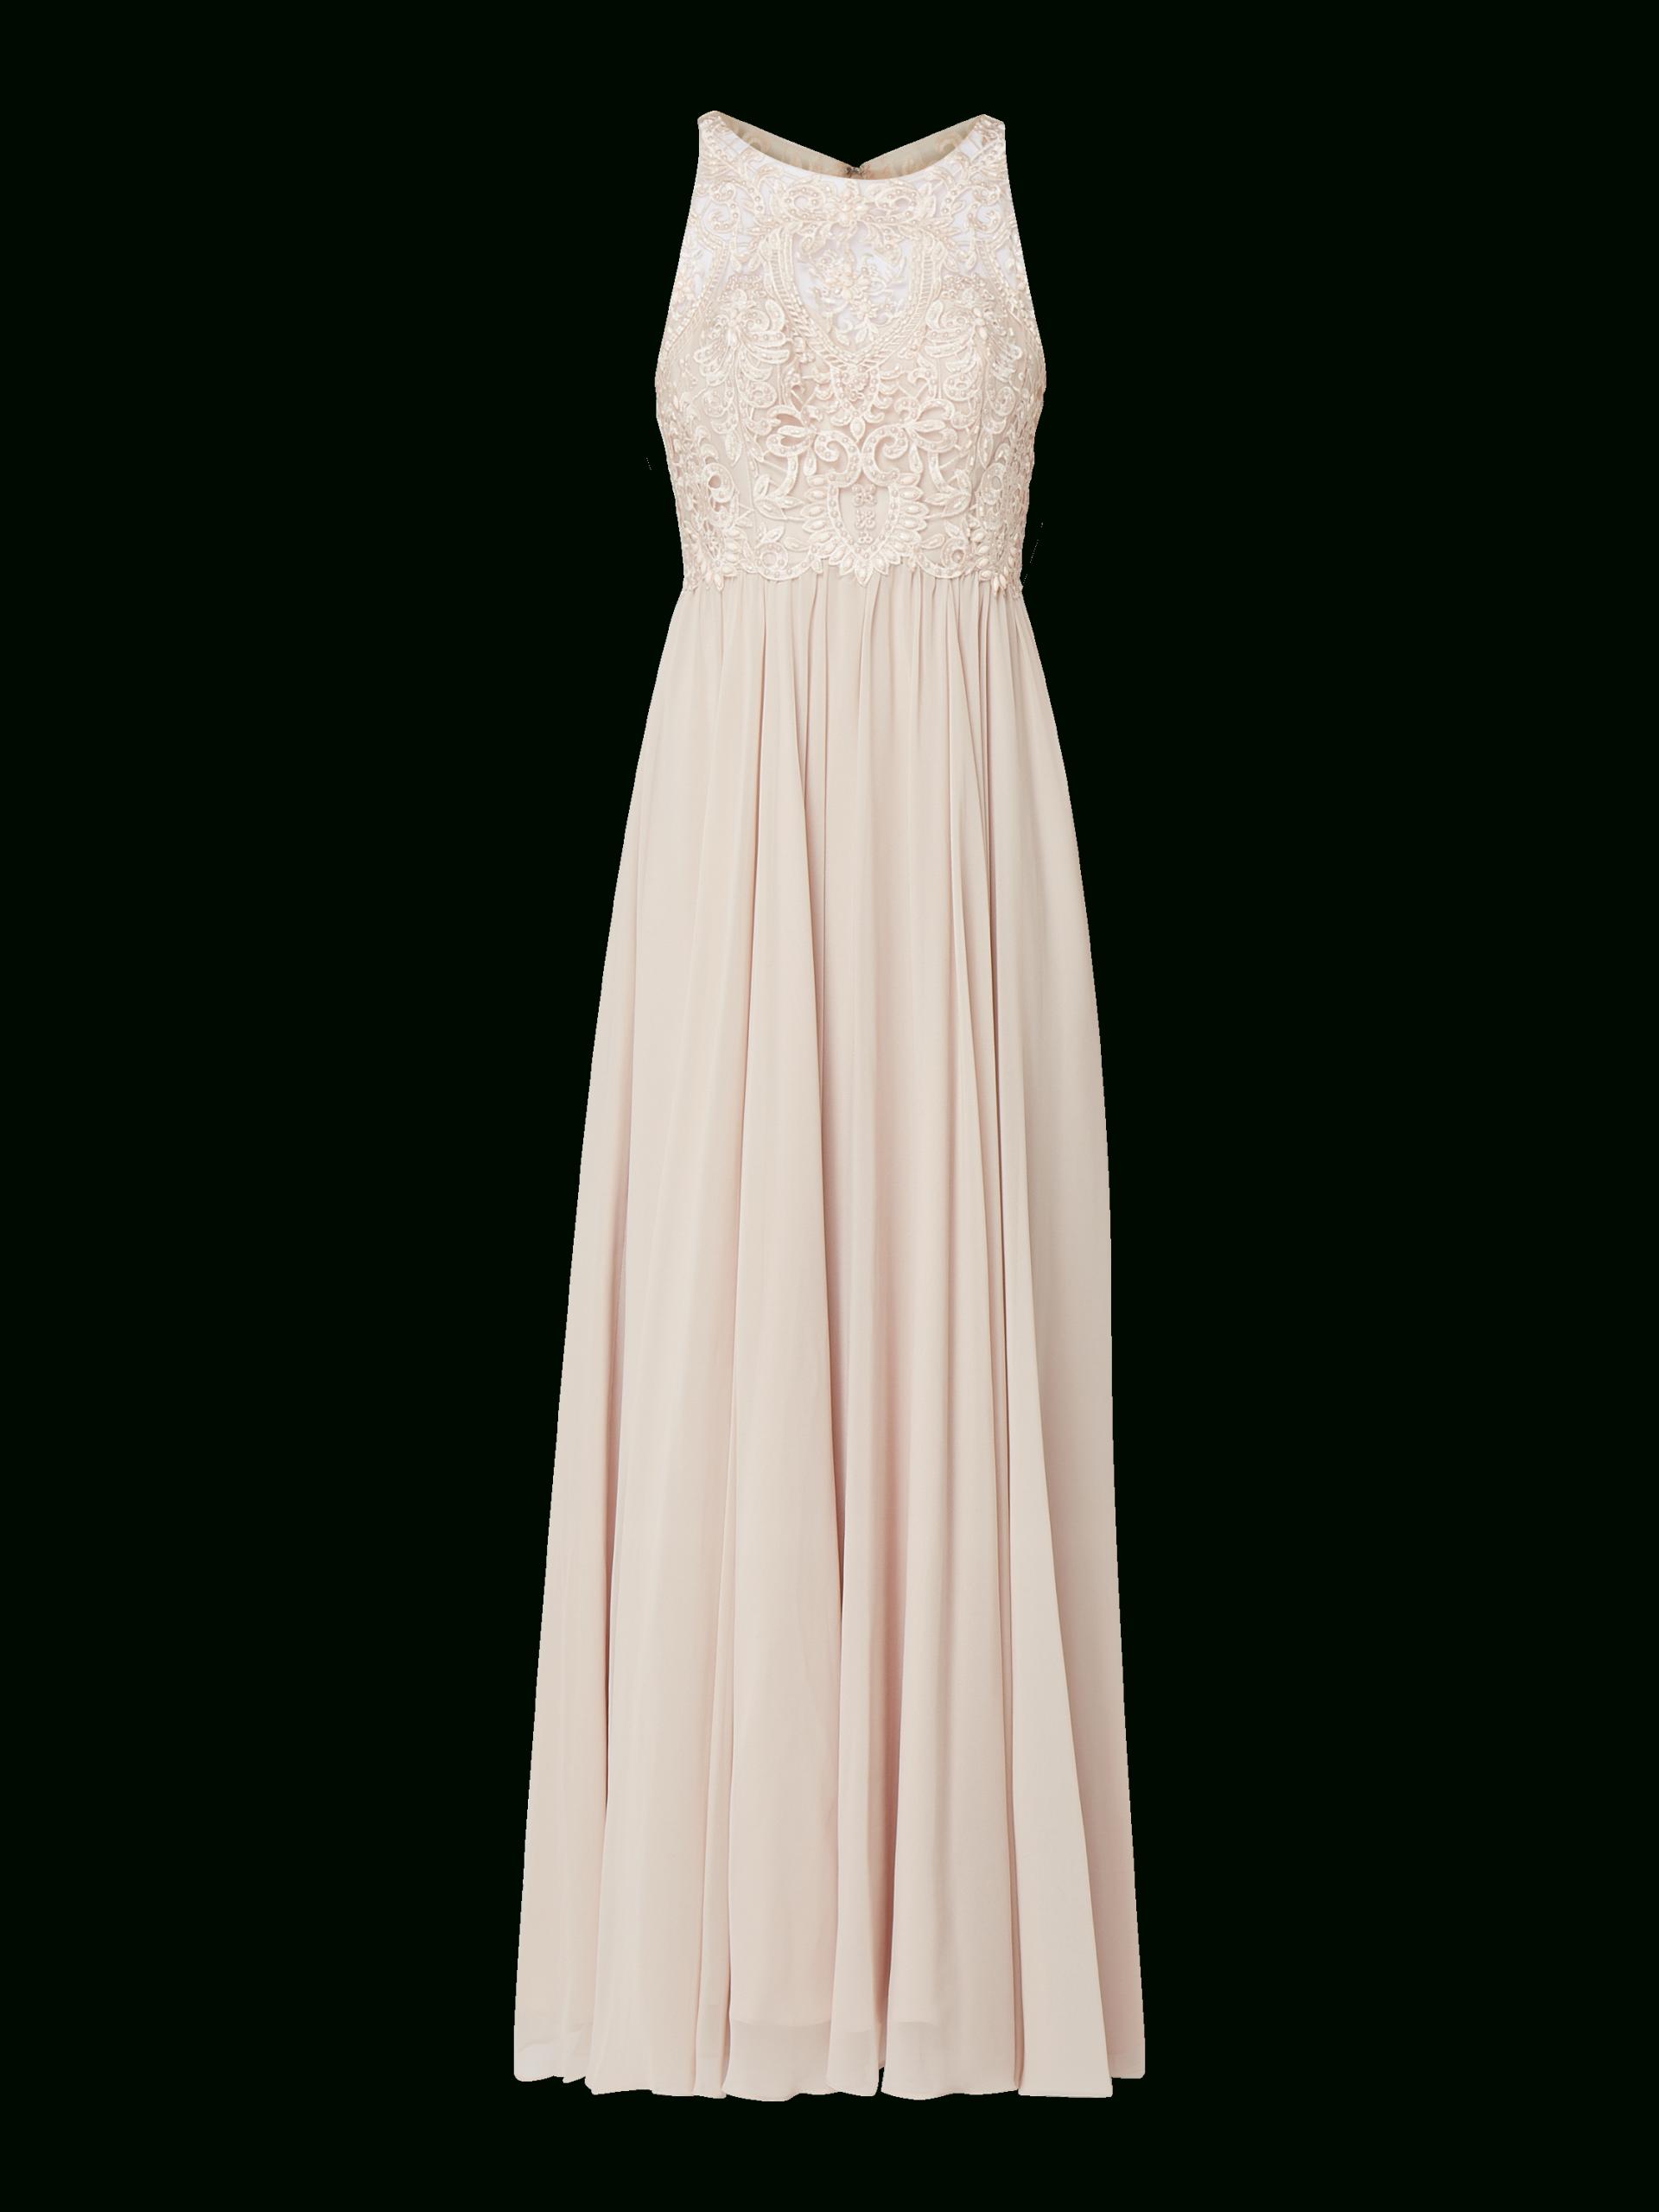 Formal Luxus Laona Abendkleid Xxl DesignDesigner Schön Laona Abendkleid Xxl Design